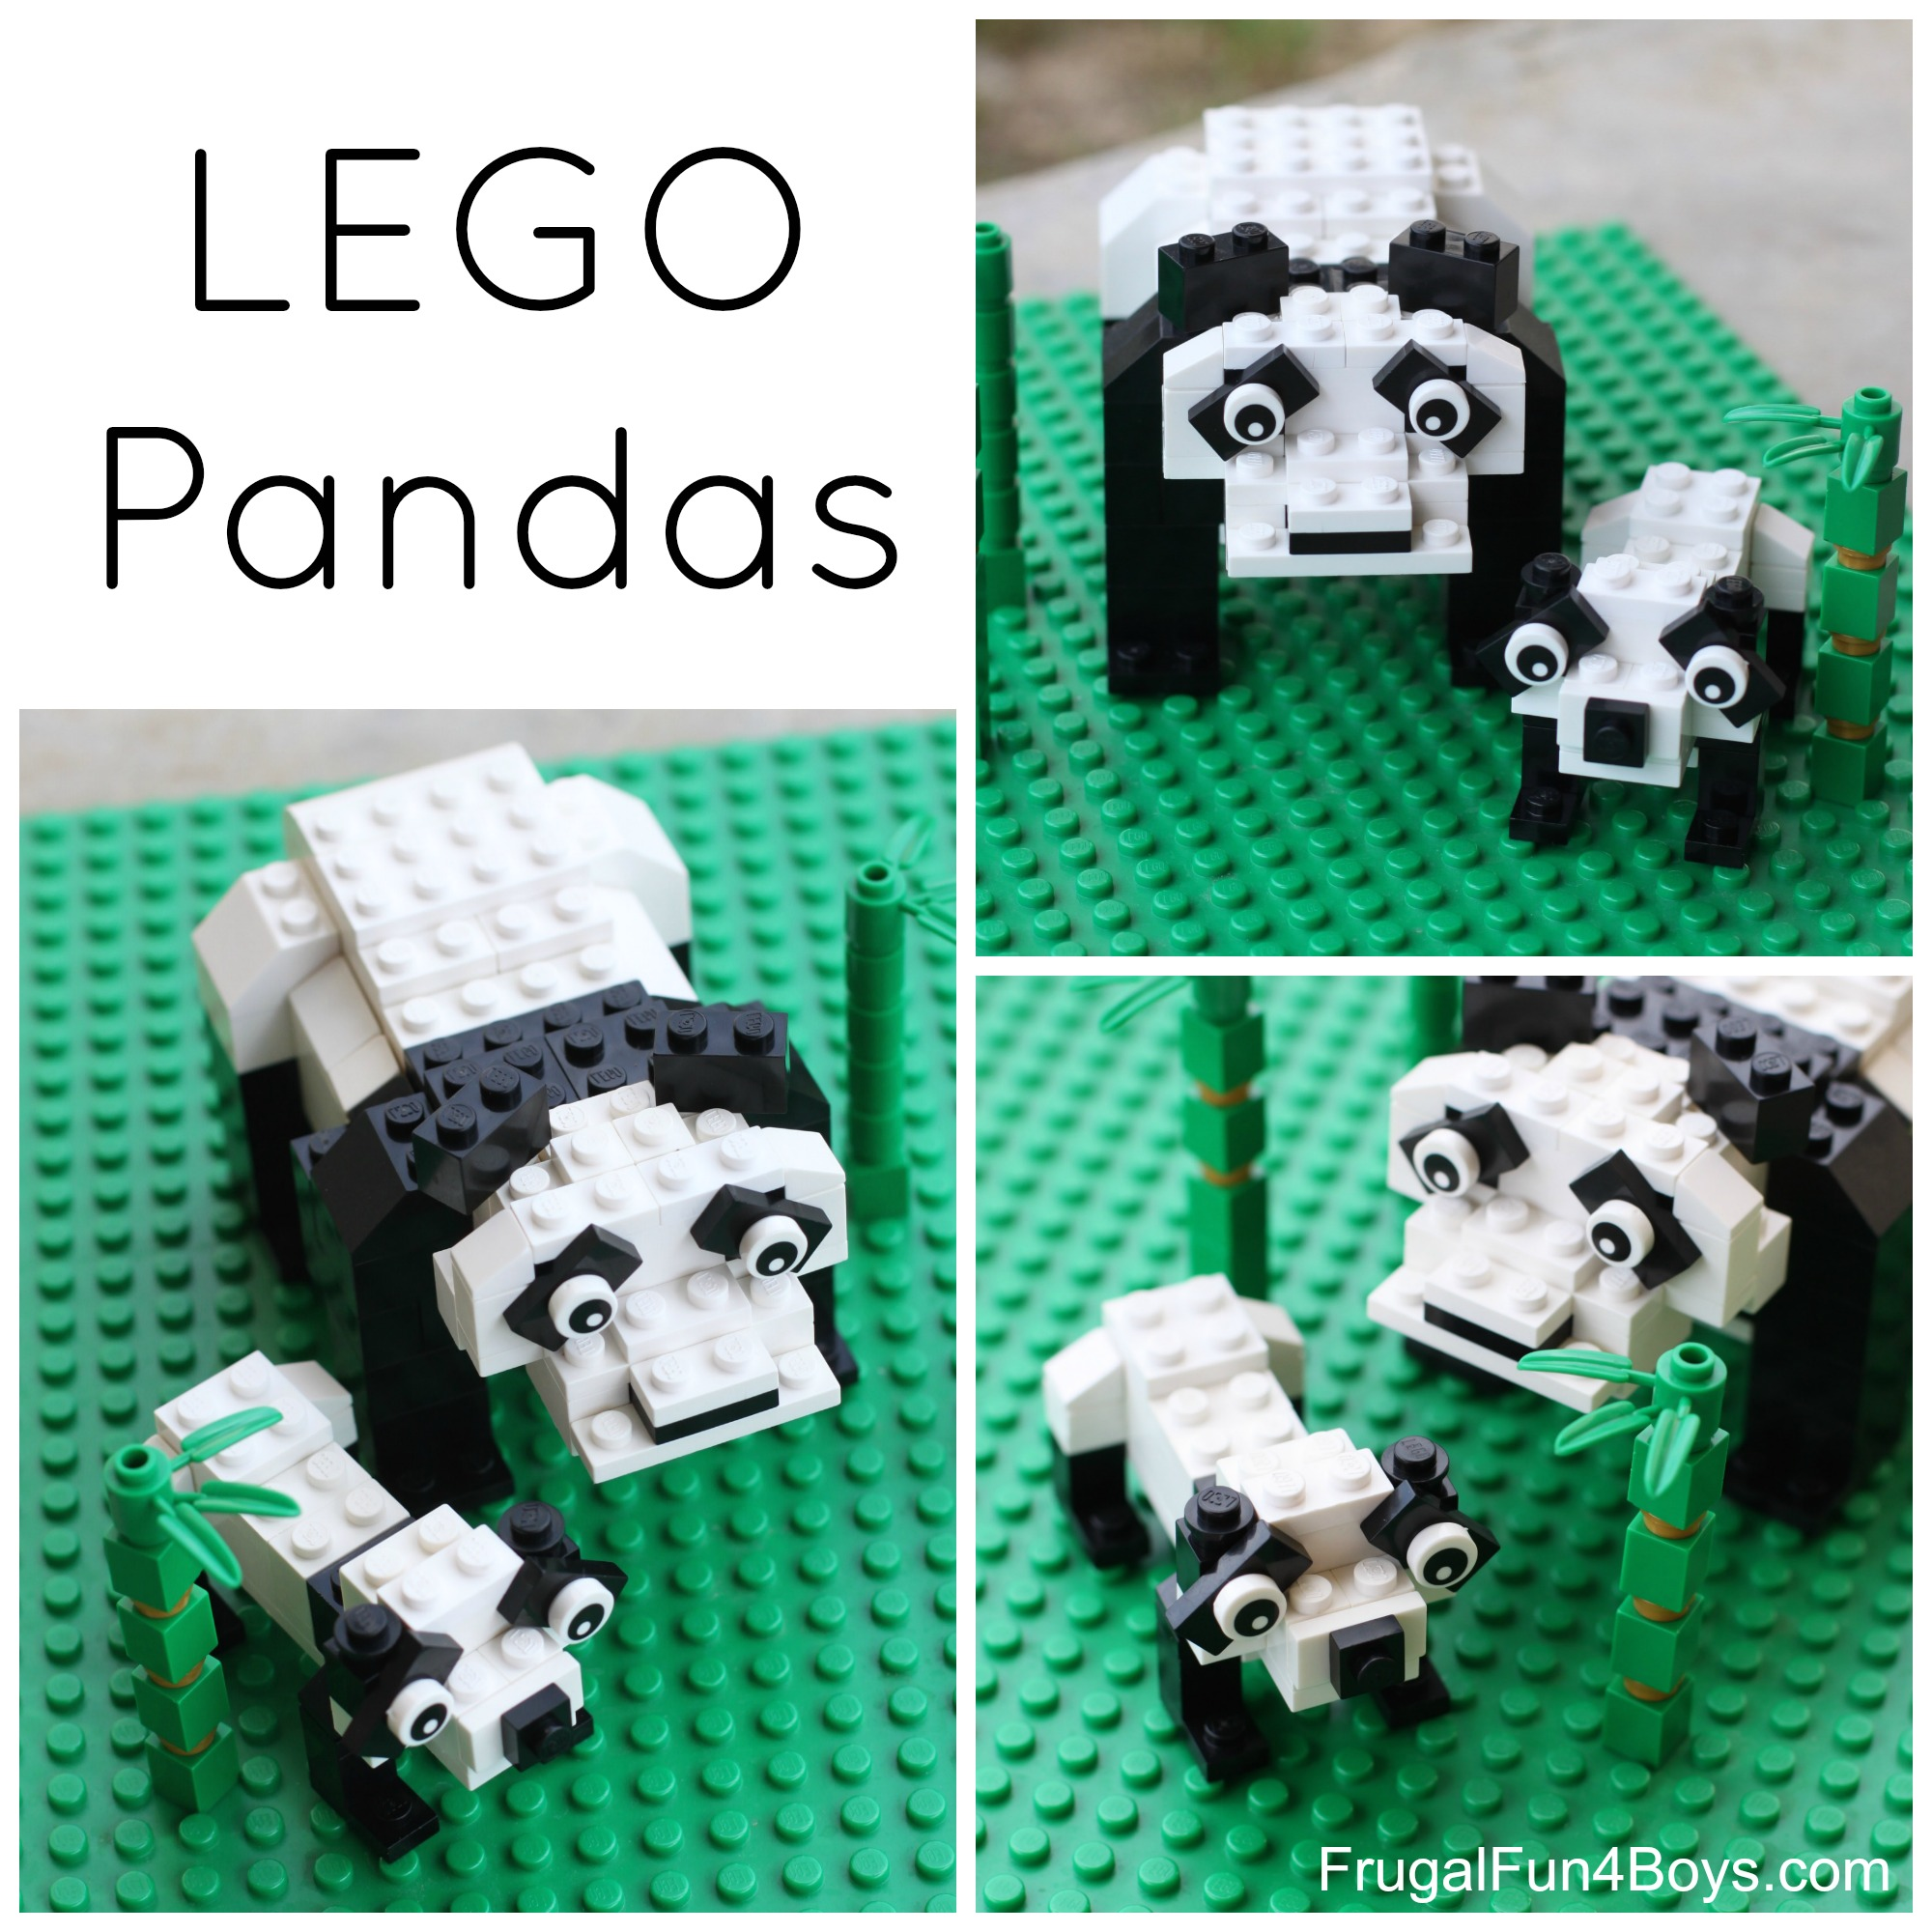 LEGO Panda Building Instructions